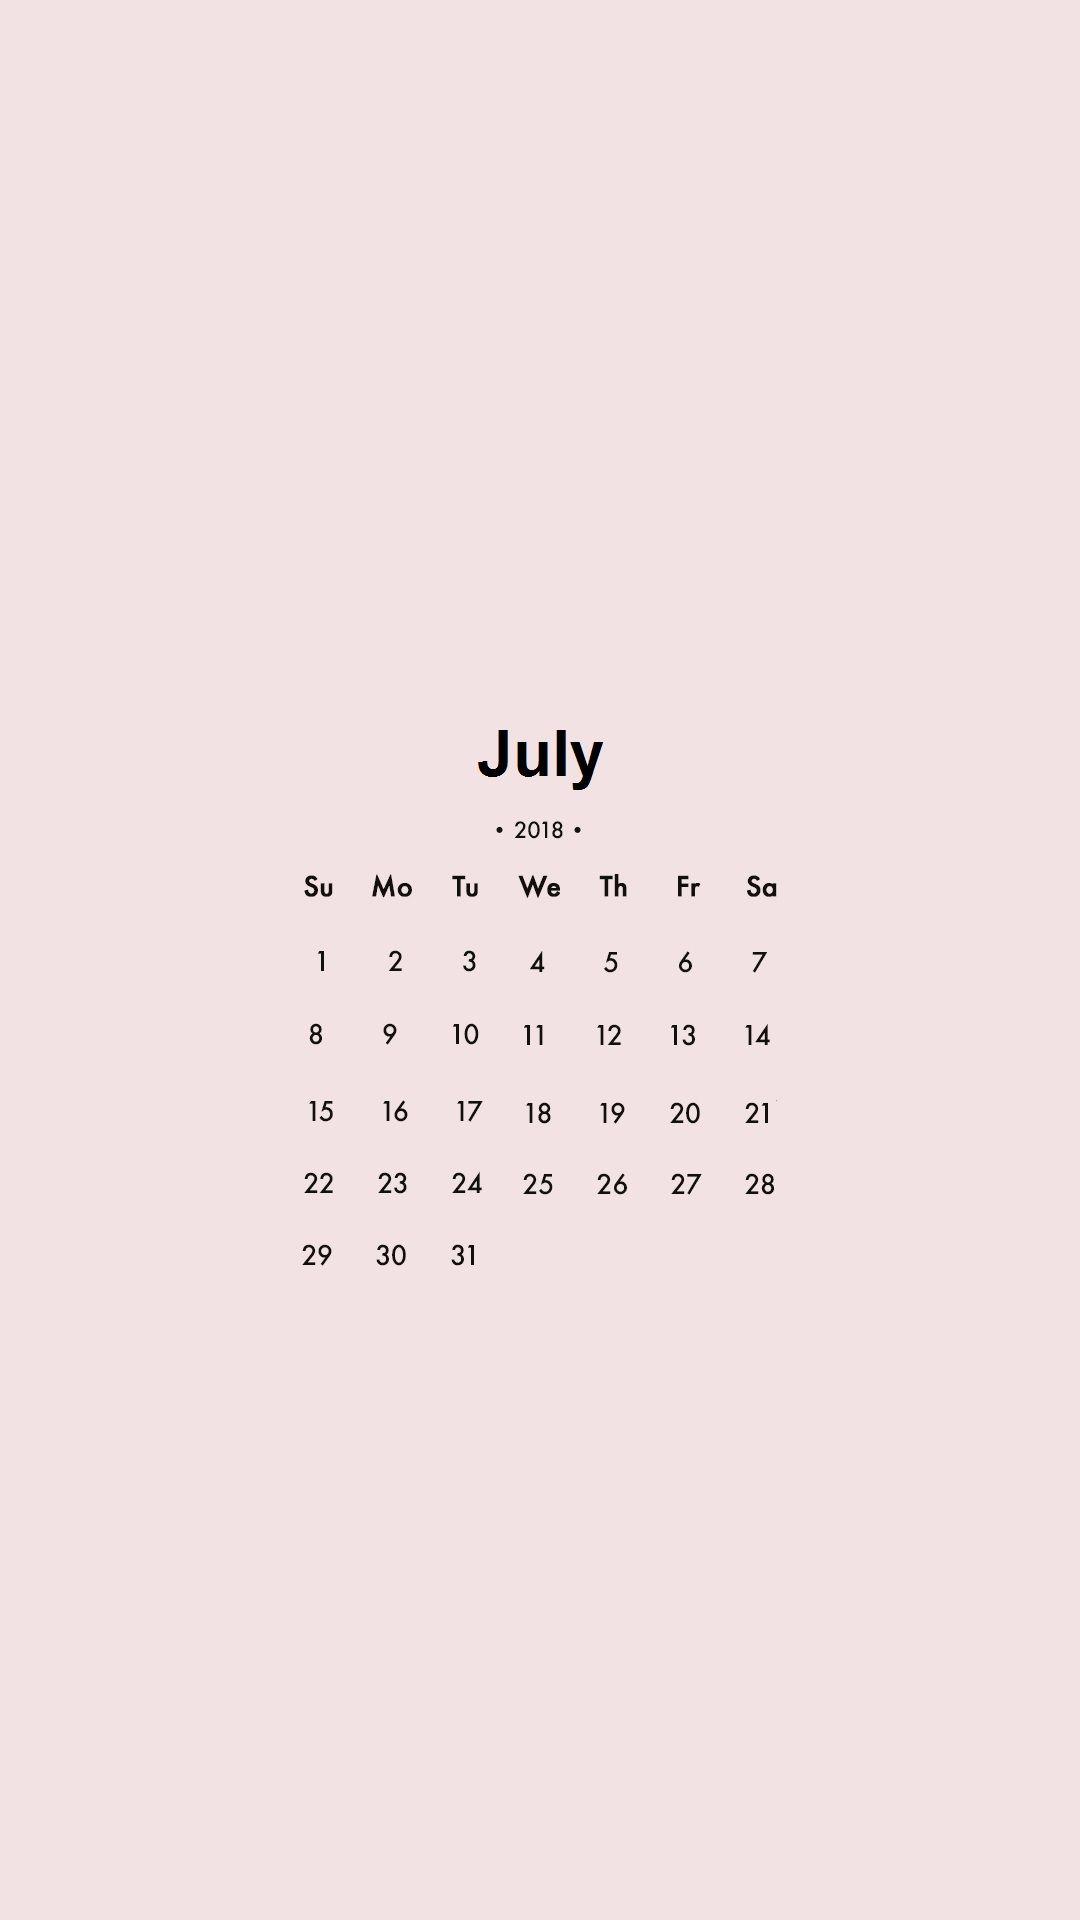 July 2018 IPhone Calendar Locked Wallpaper S Colorful Screen